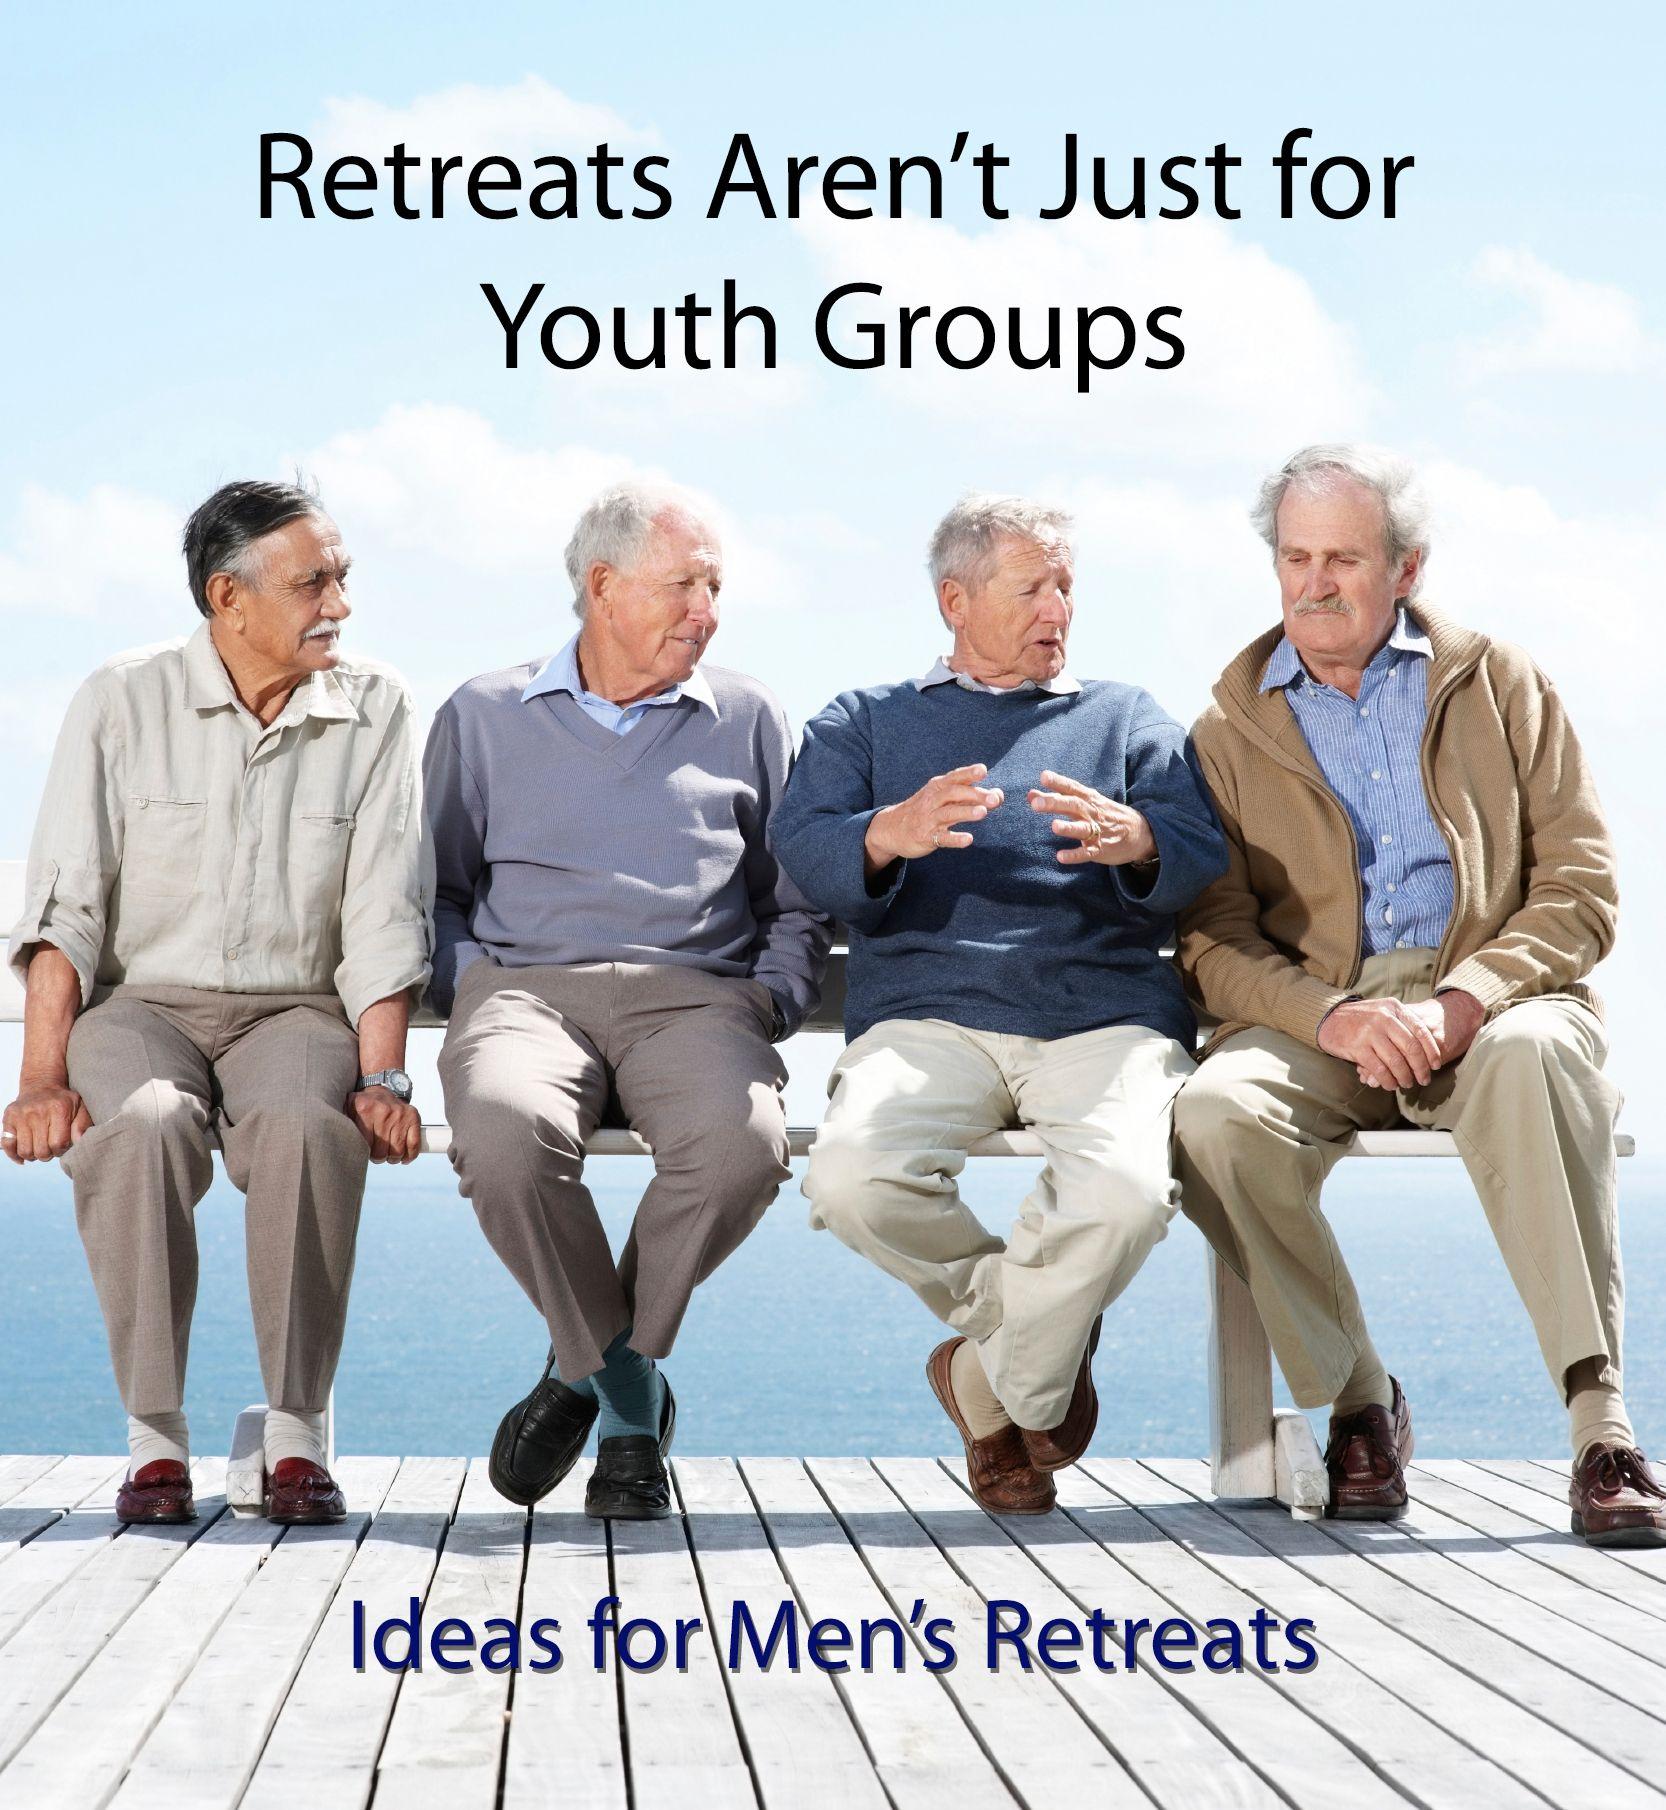 ideas for men's retreats | men's retreats | pinterest | christian